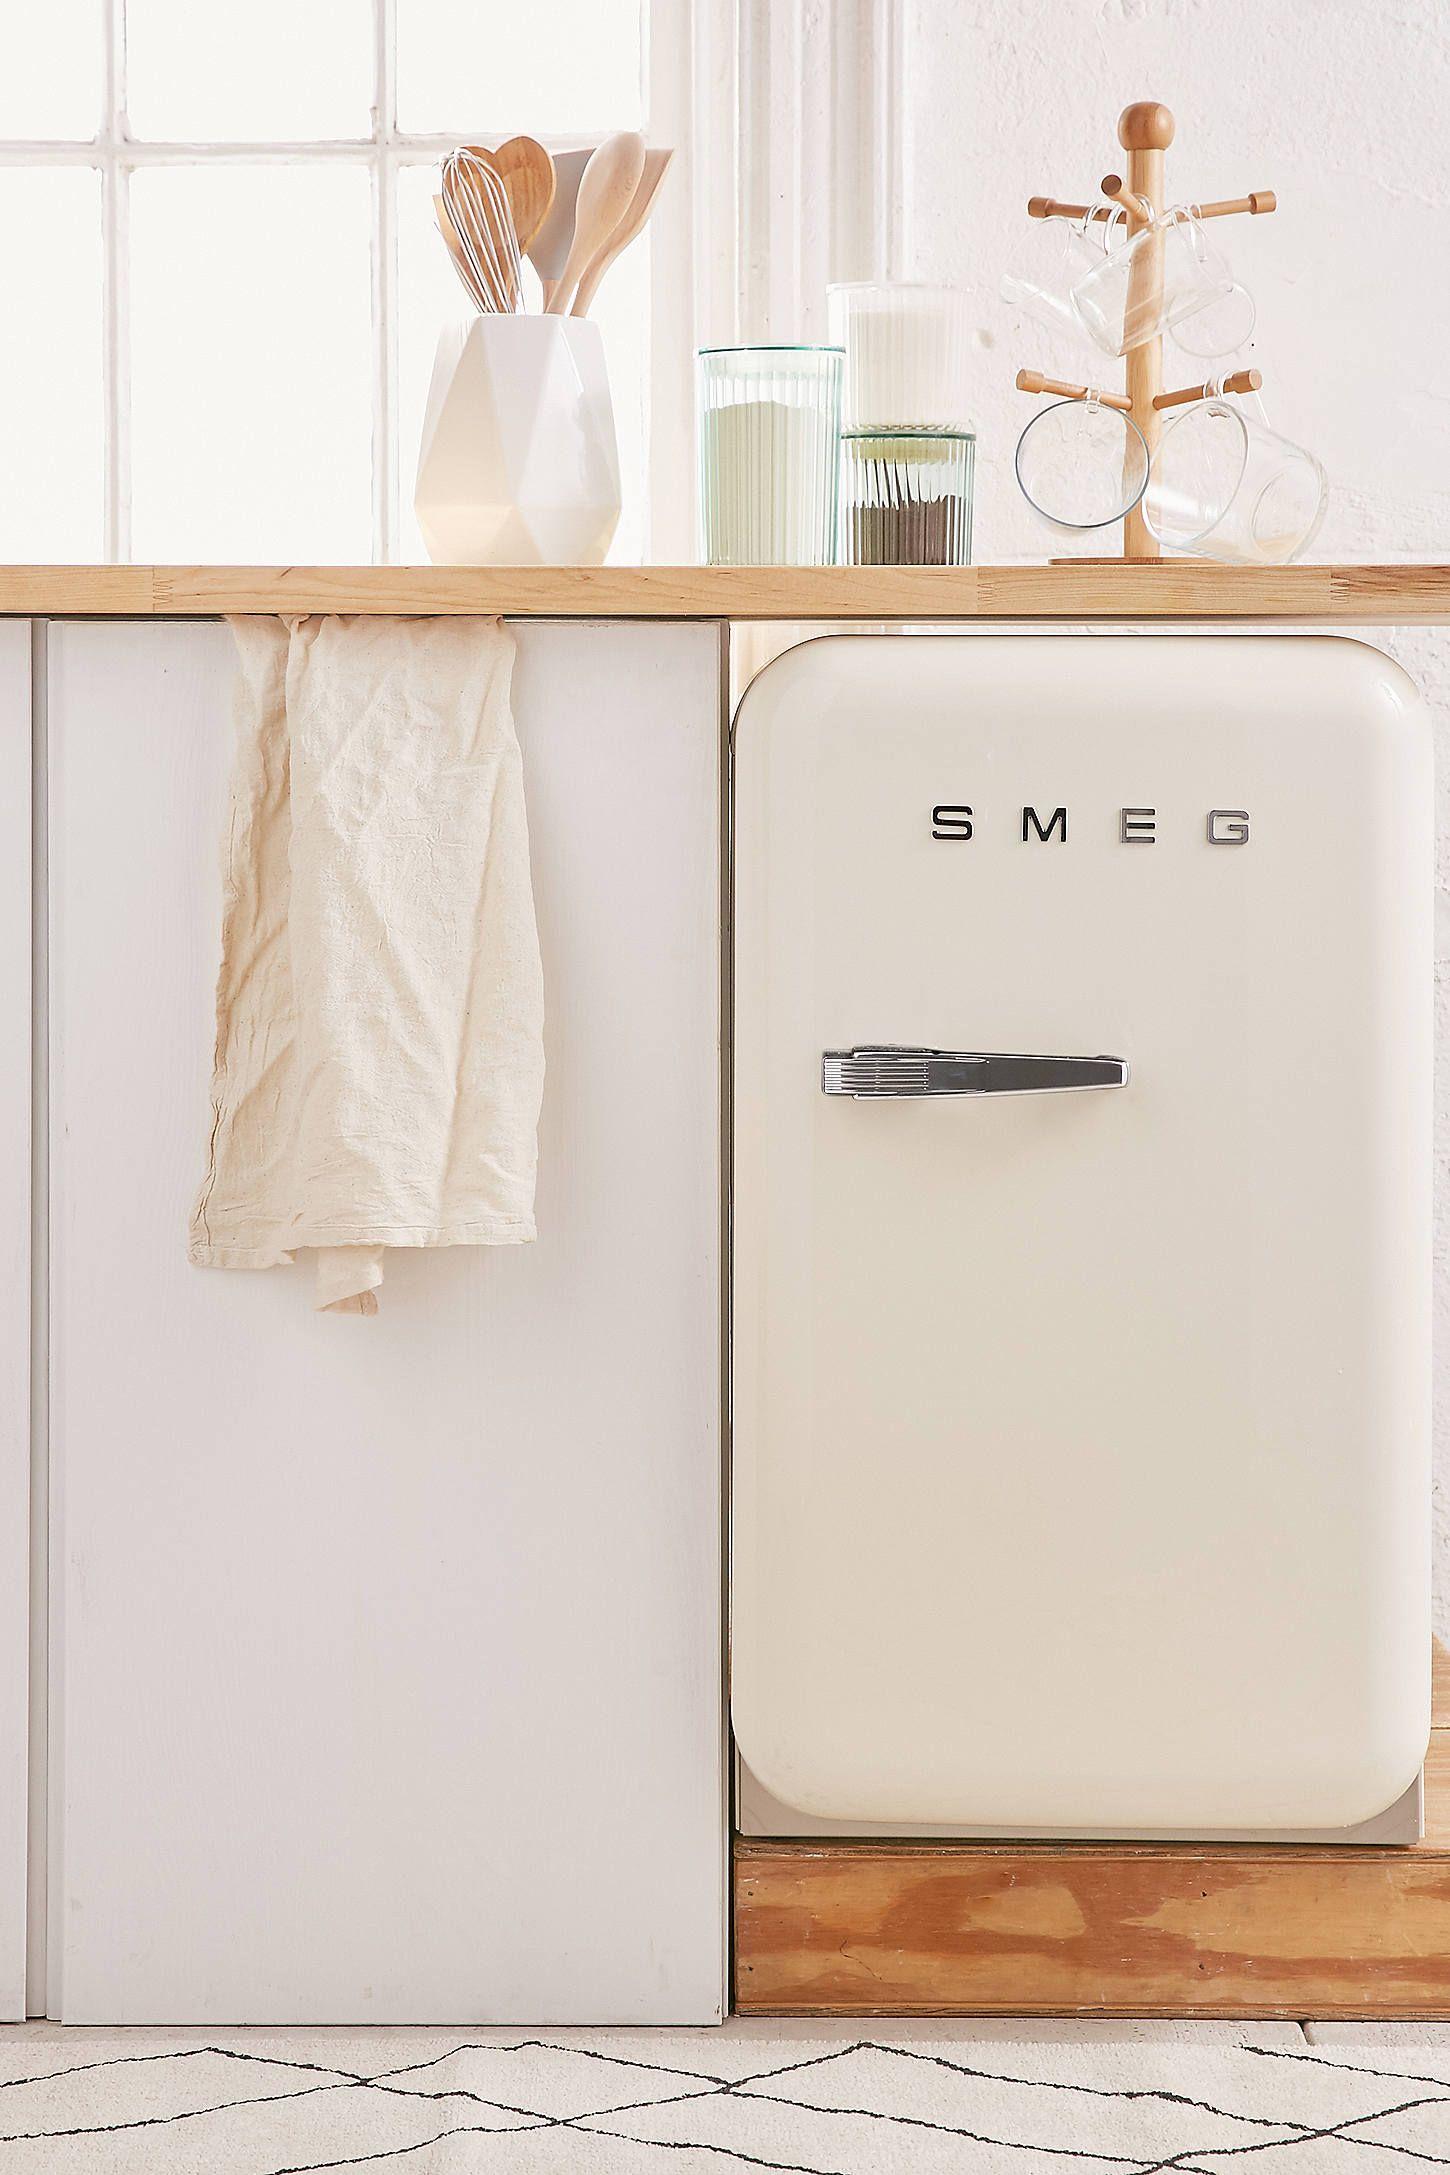 Smeg Mini Refrigerator With Images Outdoor Kitchen Design Kitchen Design Smeg Fridge